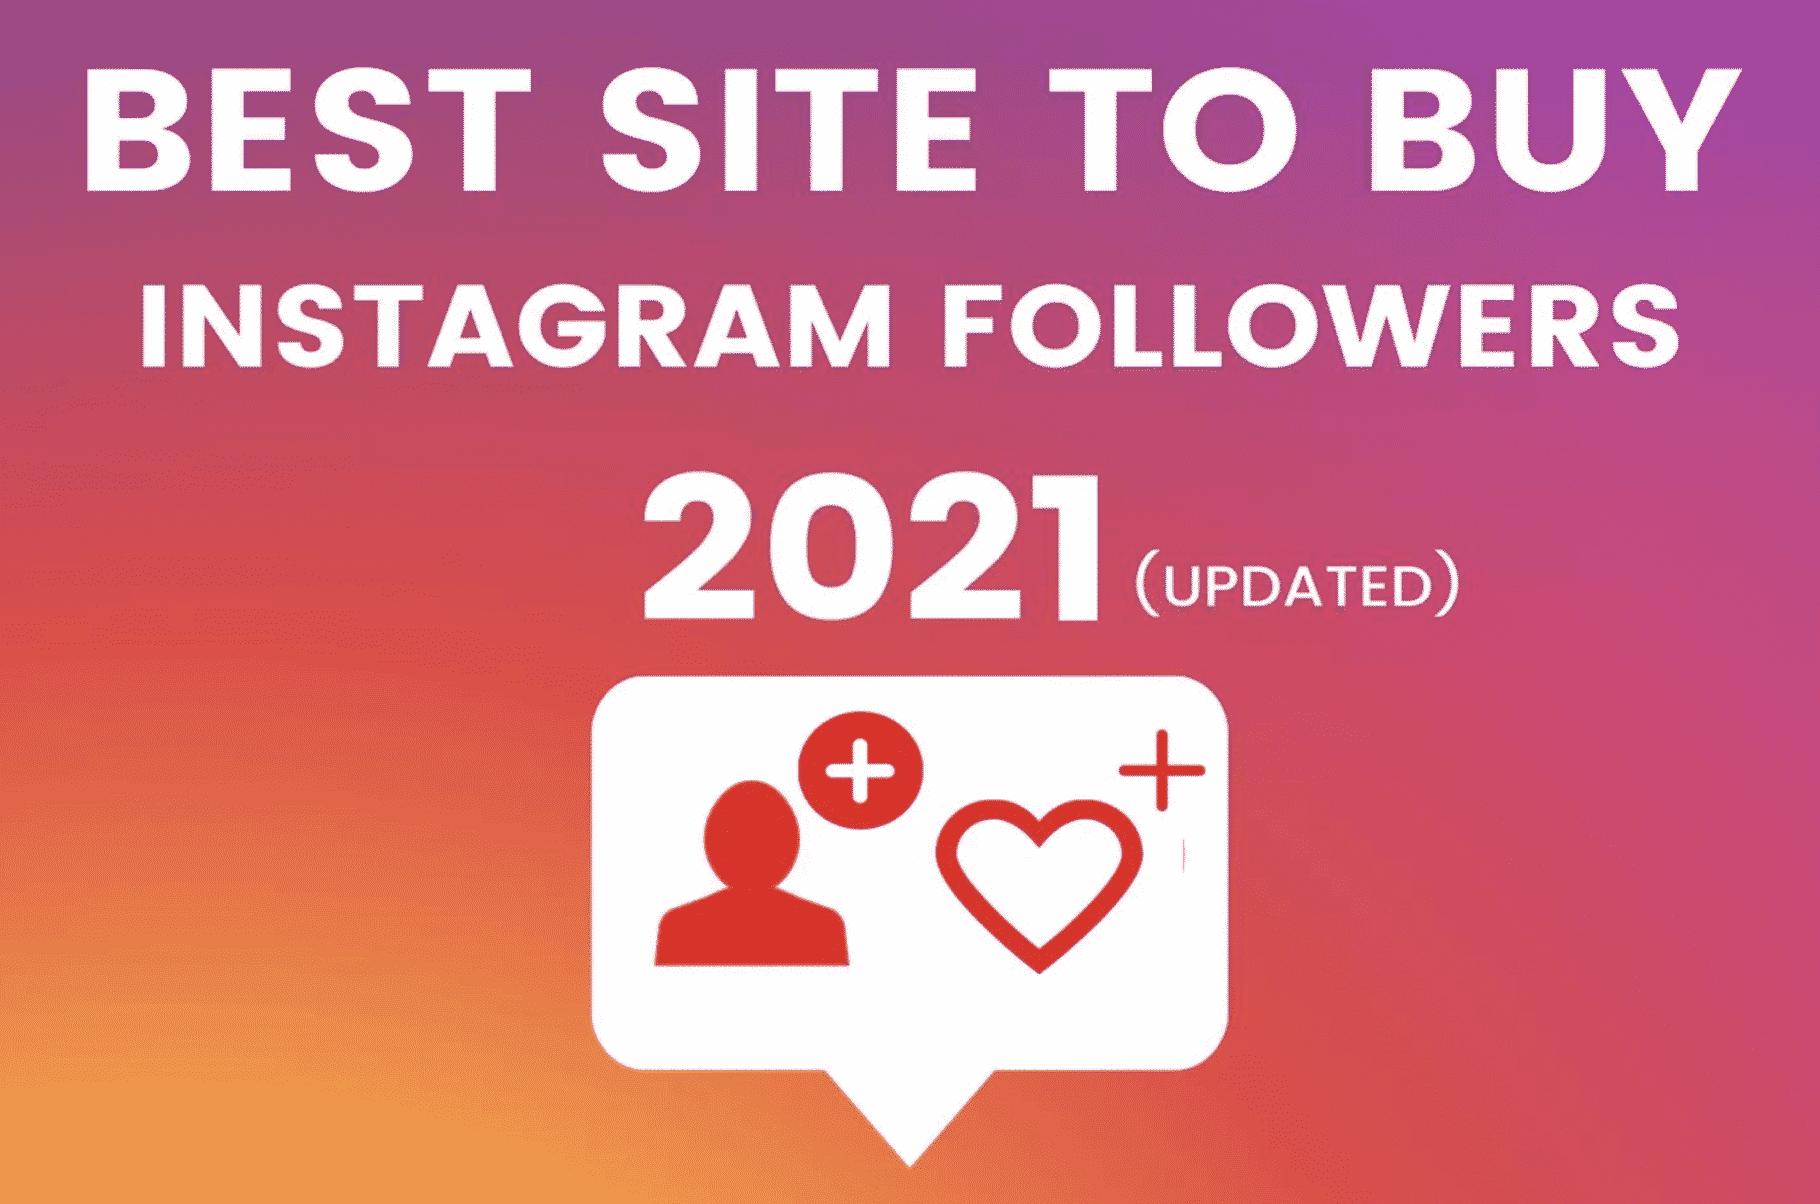 Best Site to Buy Instagram Followers UK- IGFollowers